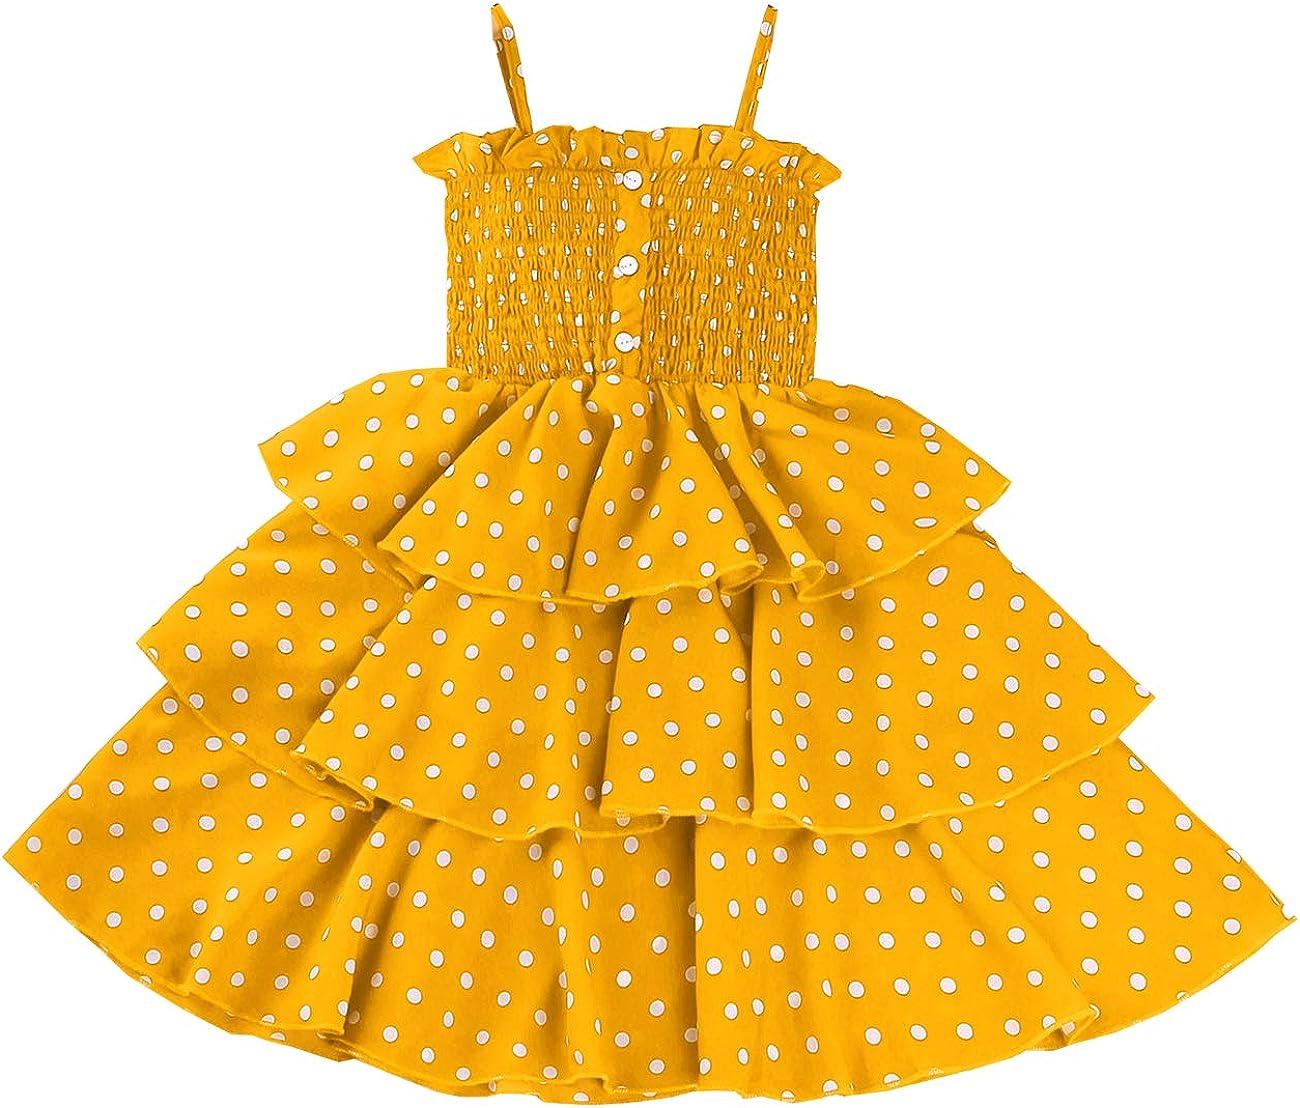 VINUOKER Lillte Girls Summer Dress Toddler Princess Sleeveless Tutu Kids A-Line Tiered Chiffon Polka Dot Cupcake Dress